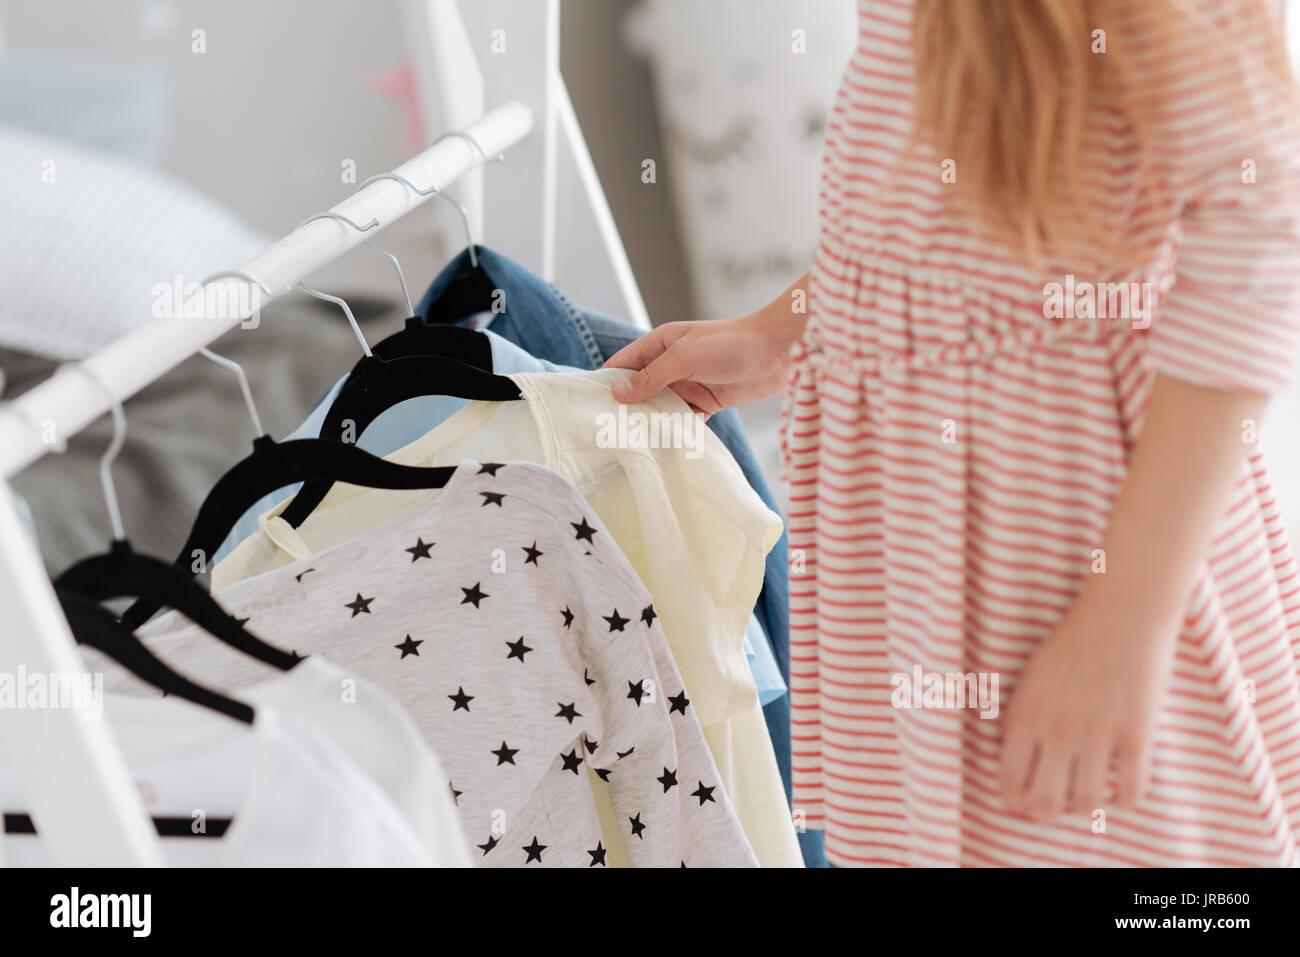 Cerca de niña mirando su closet Imagen De Stock